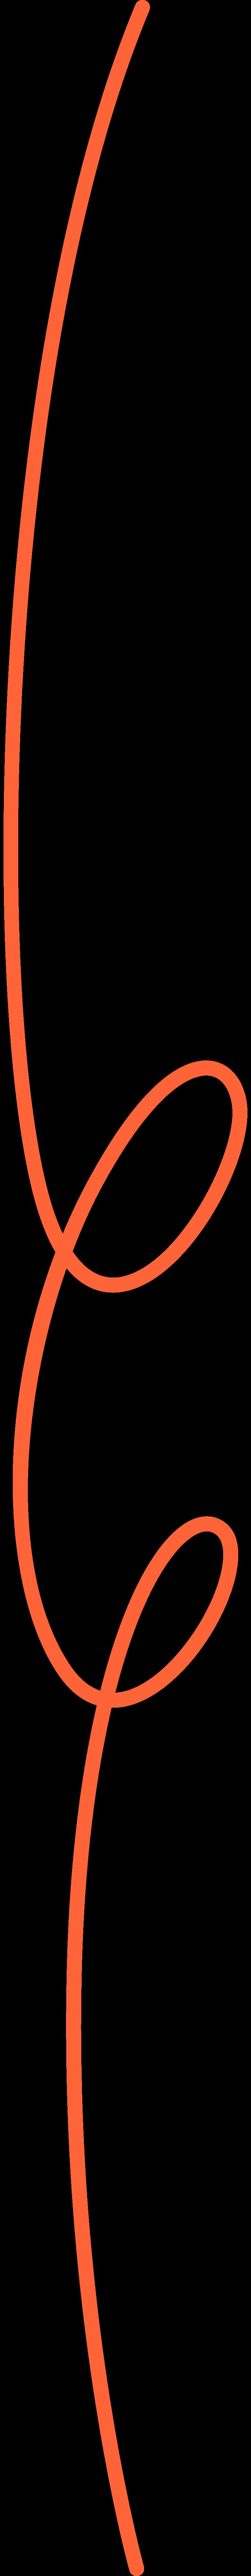 Curly line abbestellen Clipart-Grafik als PNG, SVG